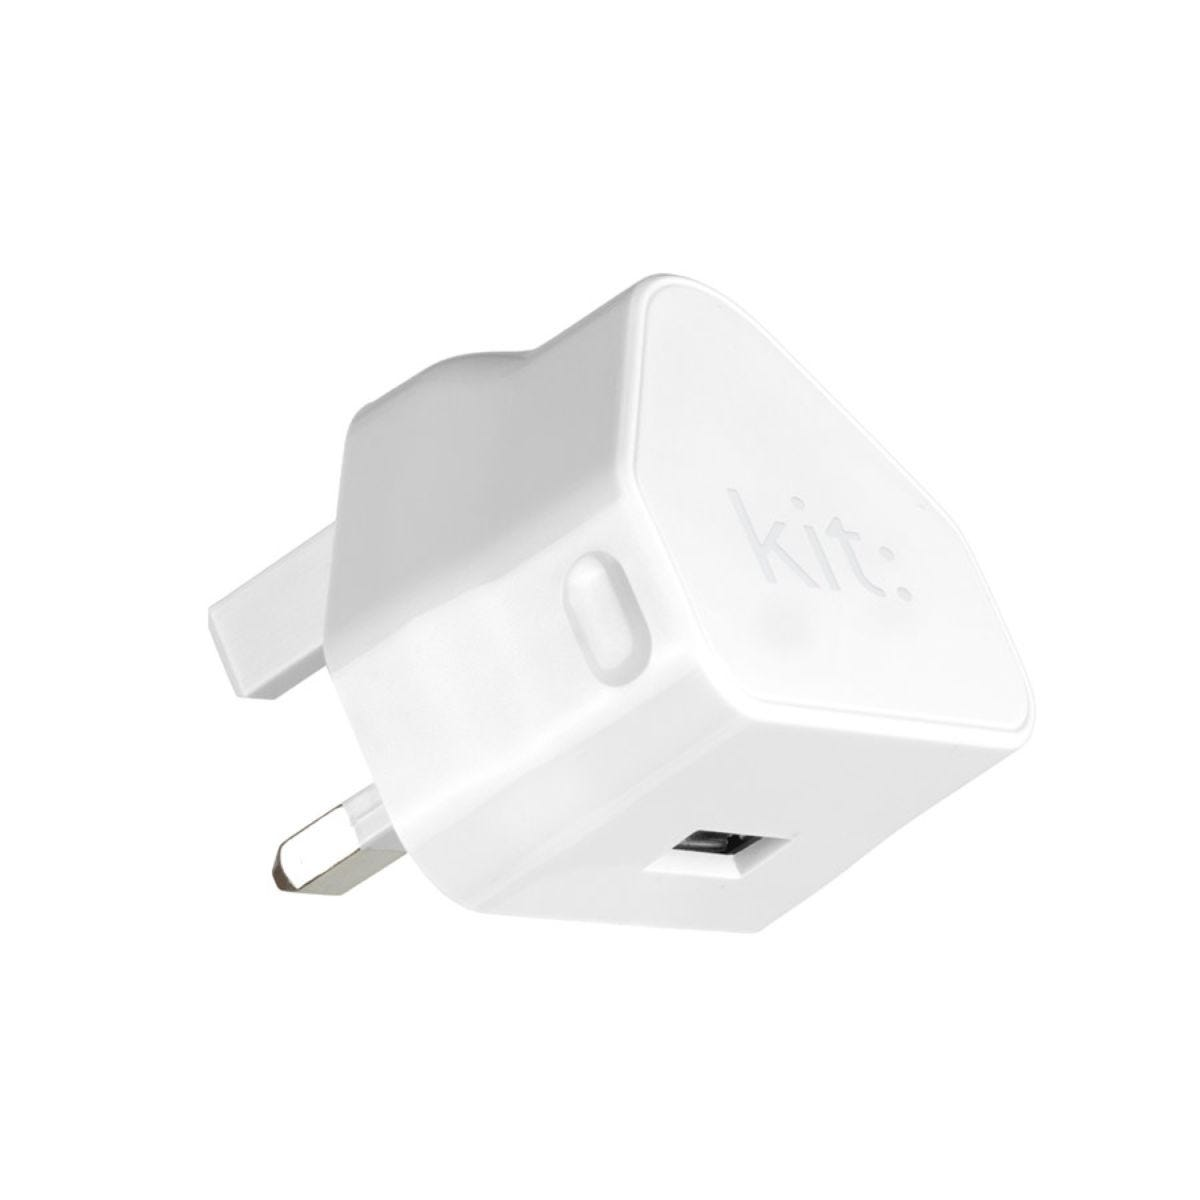 Kit USB 2.1 Amp Eco Mains Charger